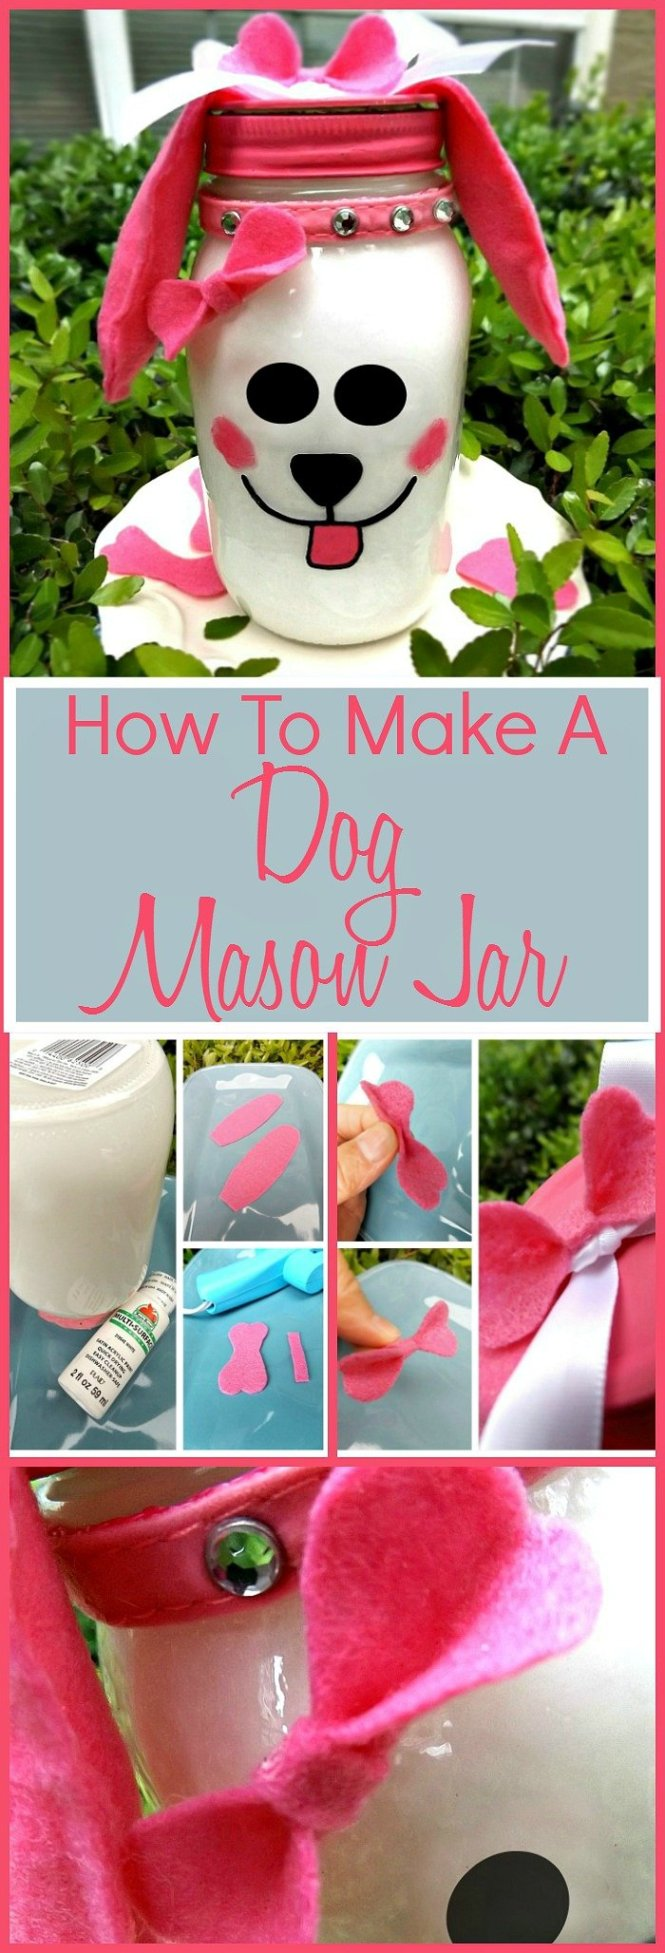 How To Make A Puppy Dog Mason Jar Craft.